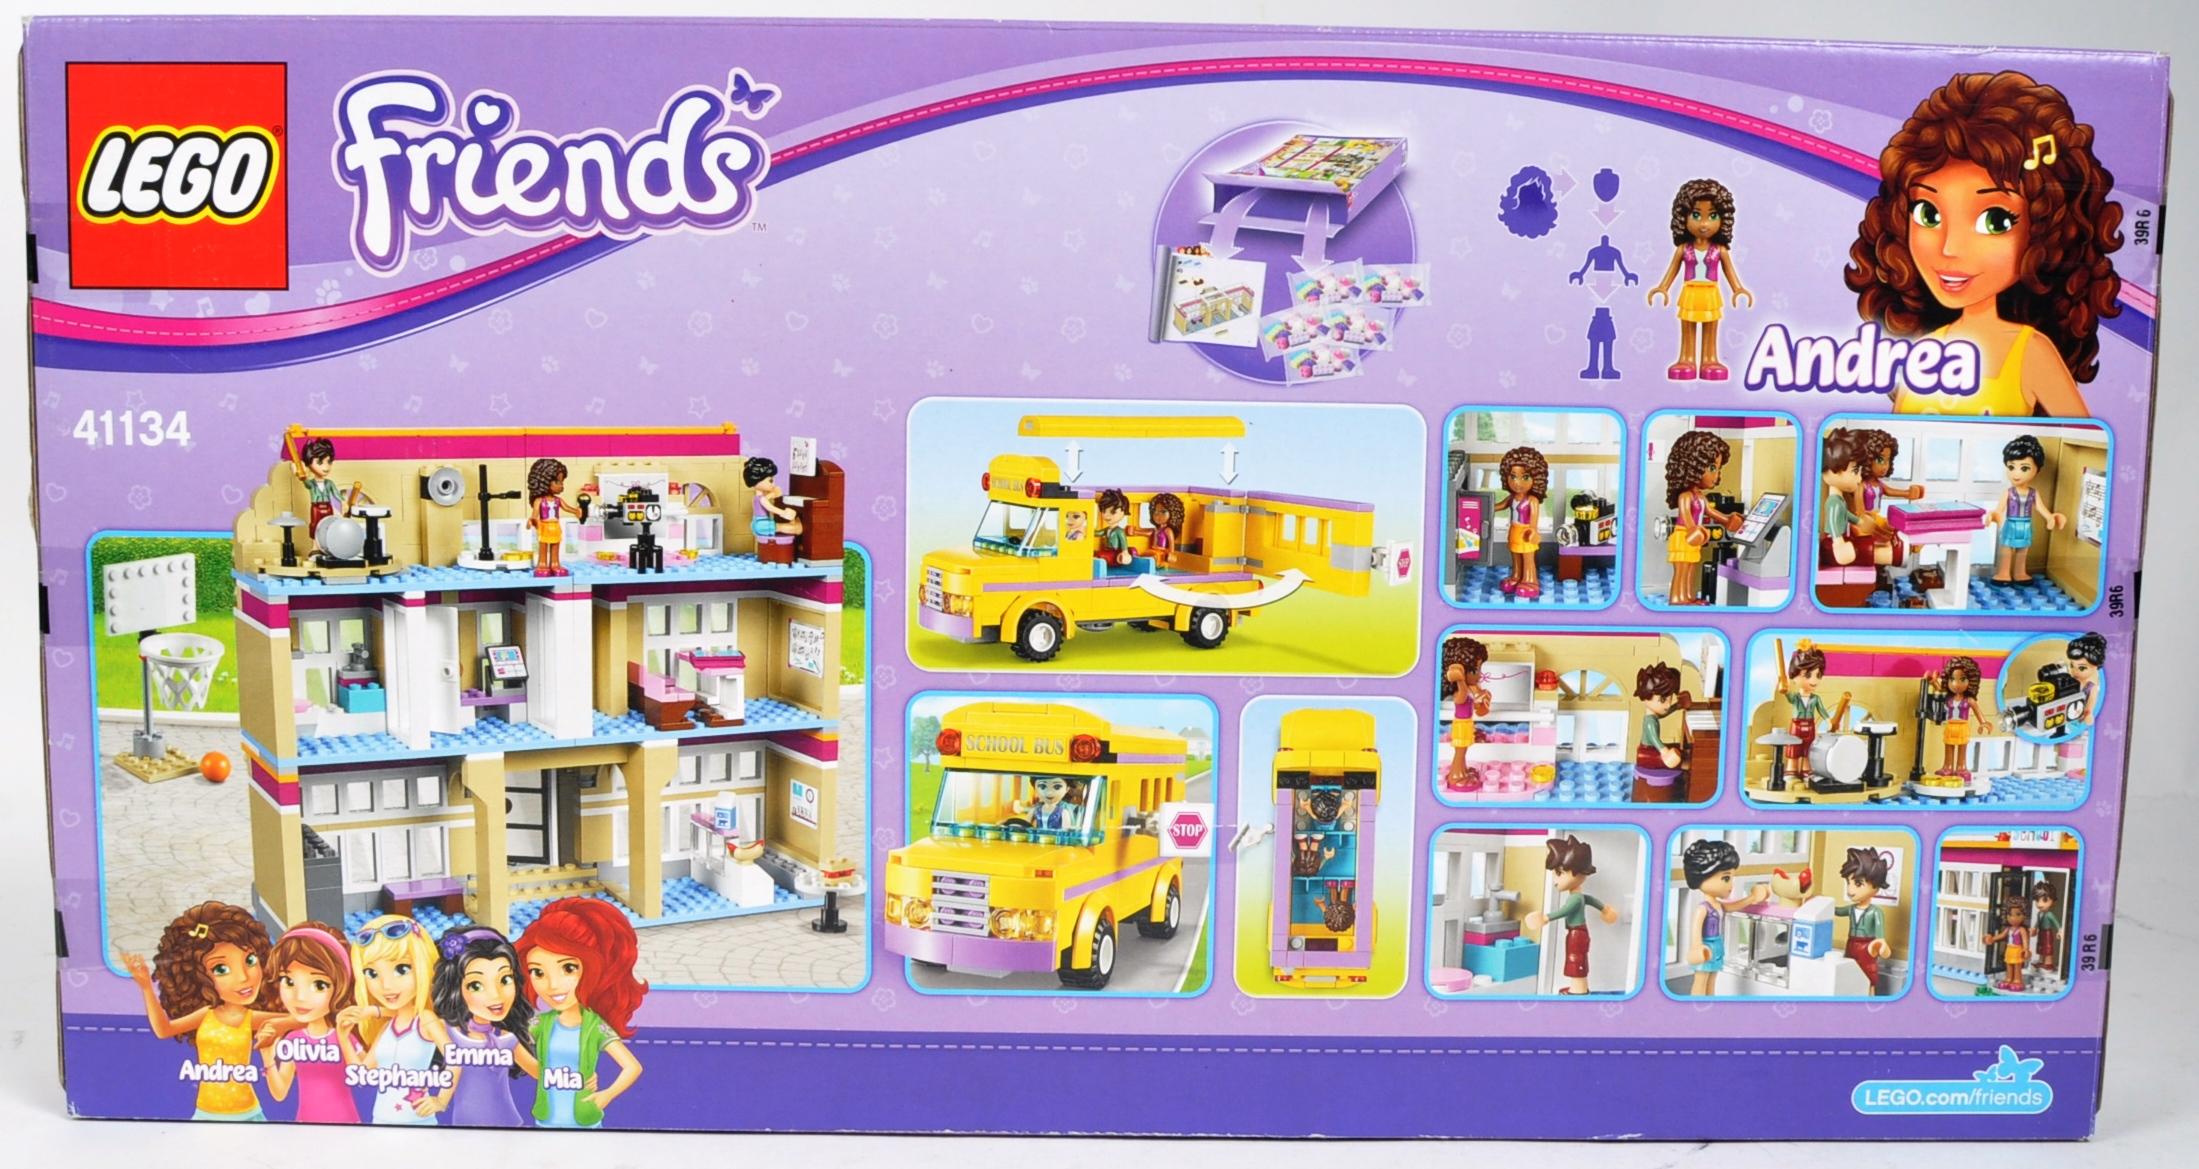 LEGO SET - LEGO FRIENDS - 41134 - HEARTLAKE PERFORMANCE SCHOOL - Image 2 of 4